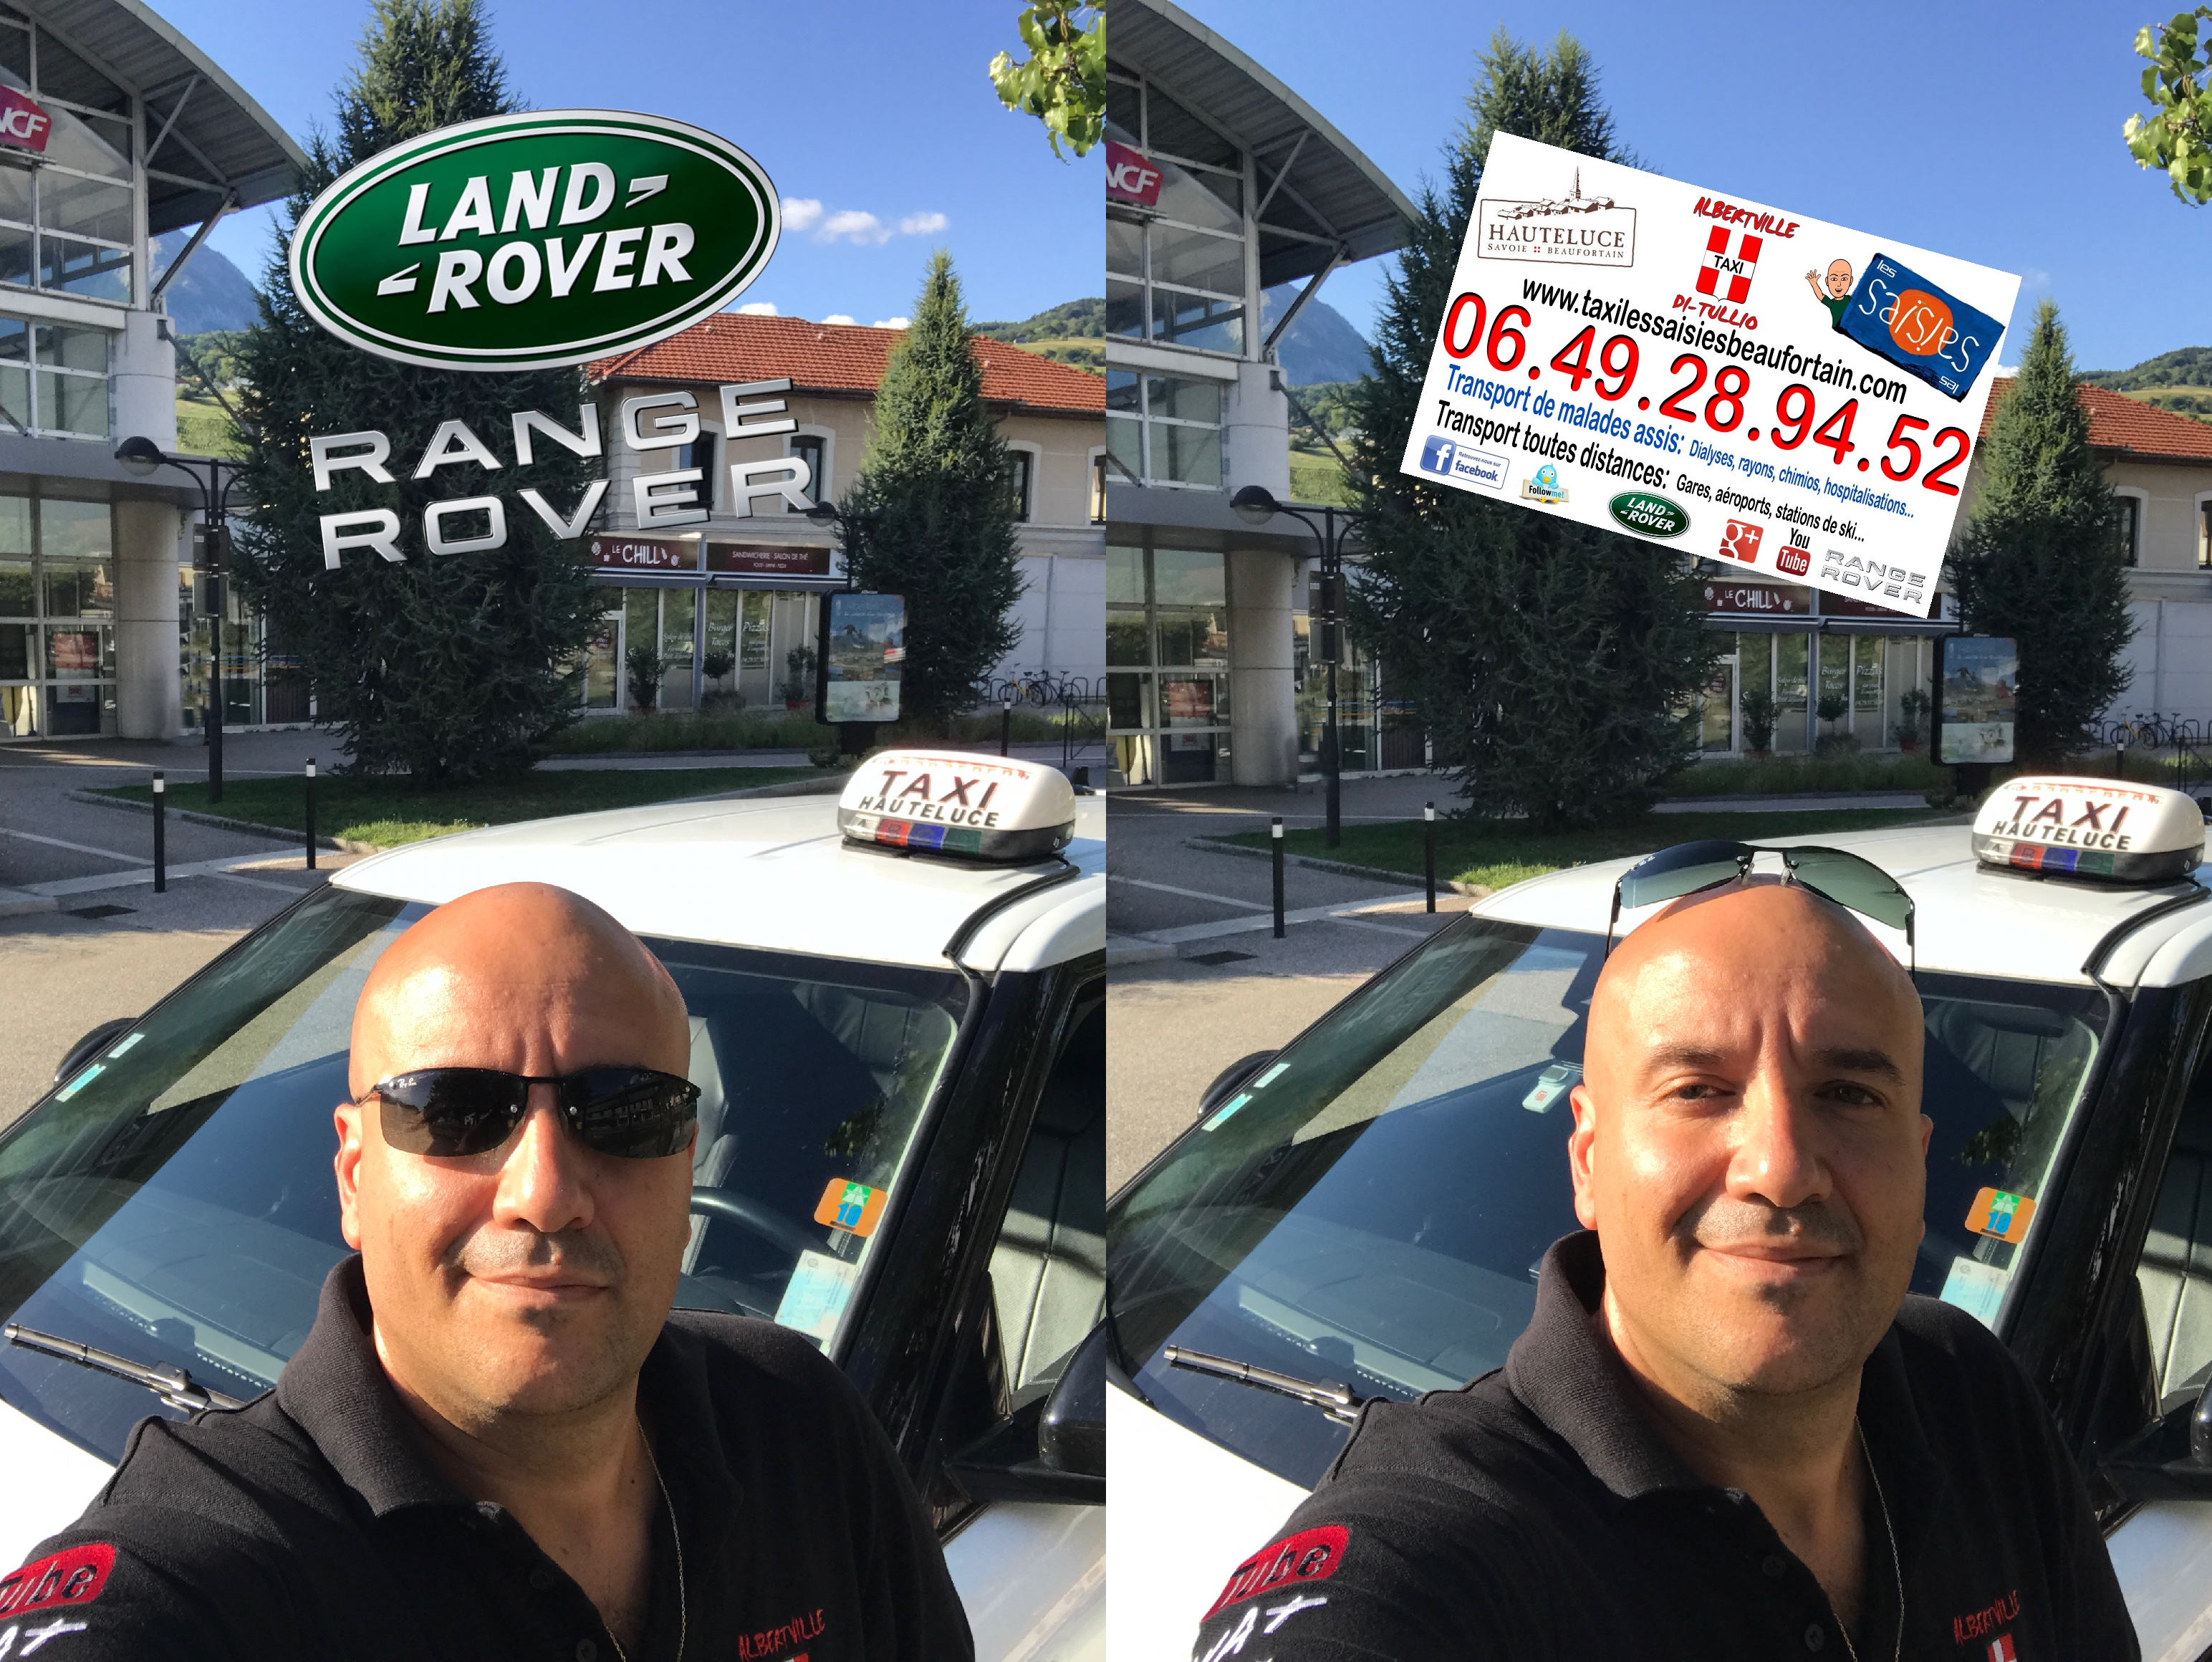 Taxi Albertville Di Tullio: 06.49.28.94.52.